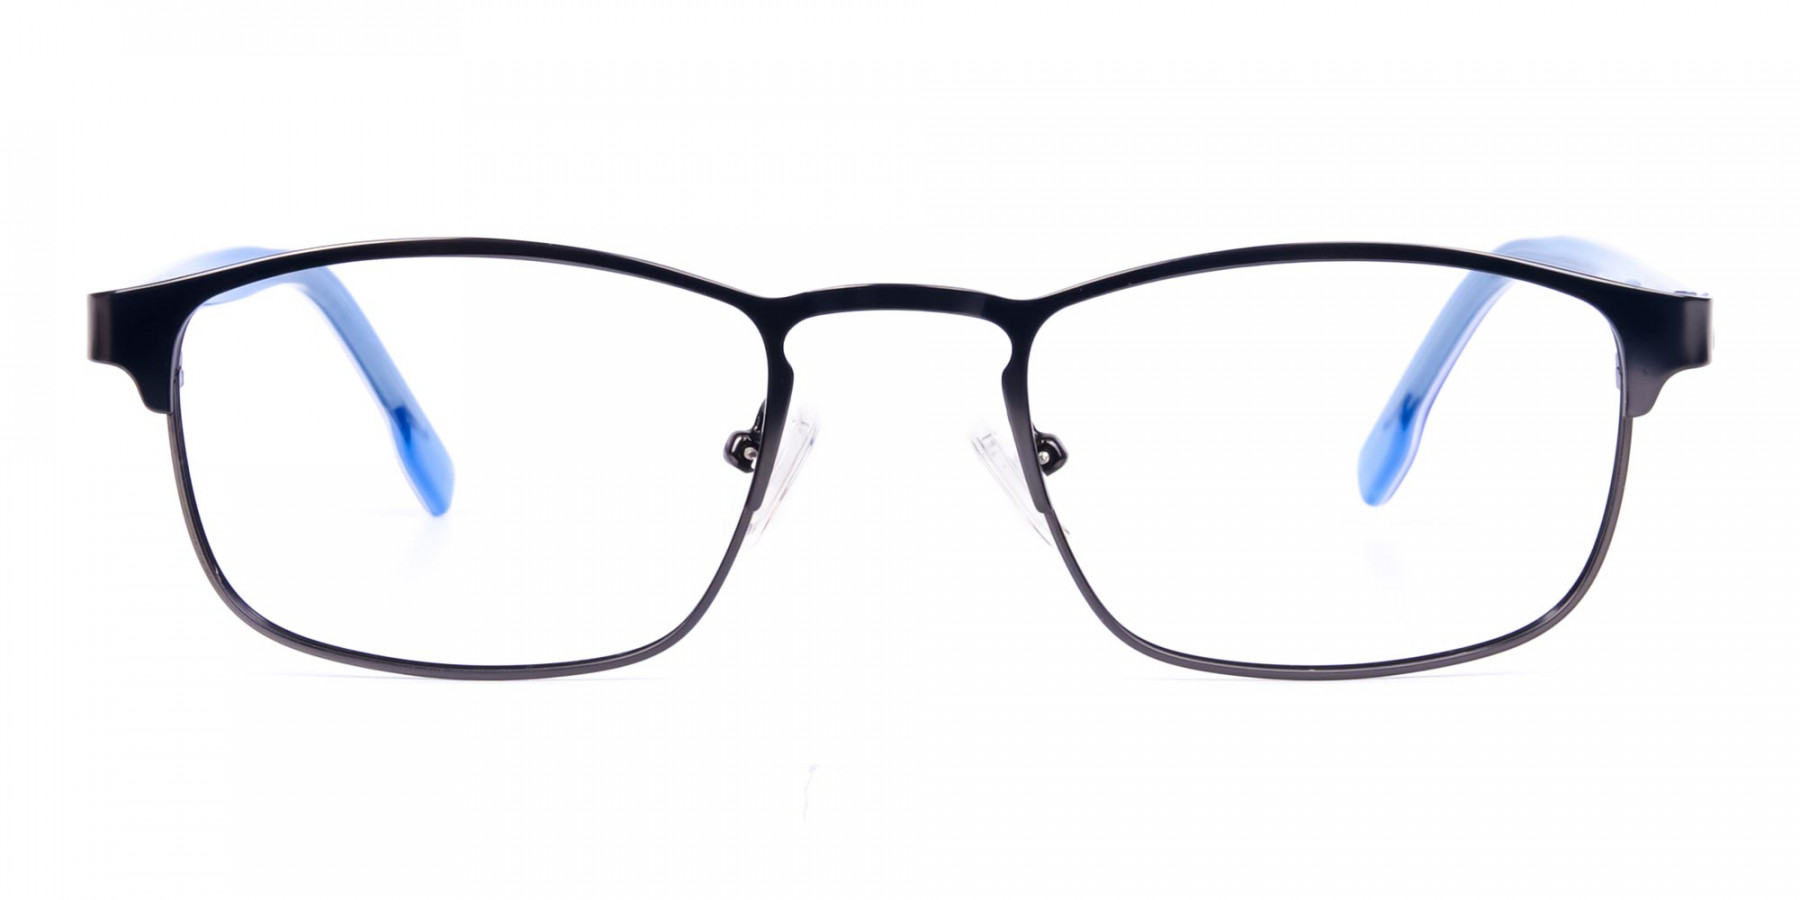 titanium glasses frames online-1